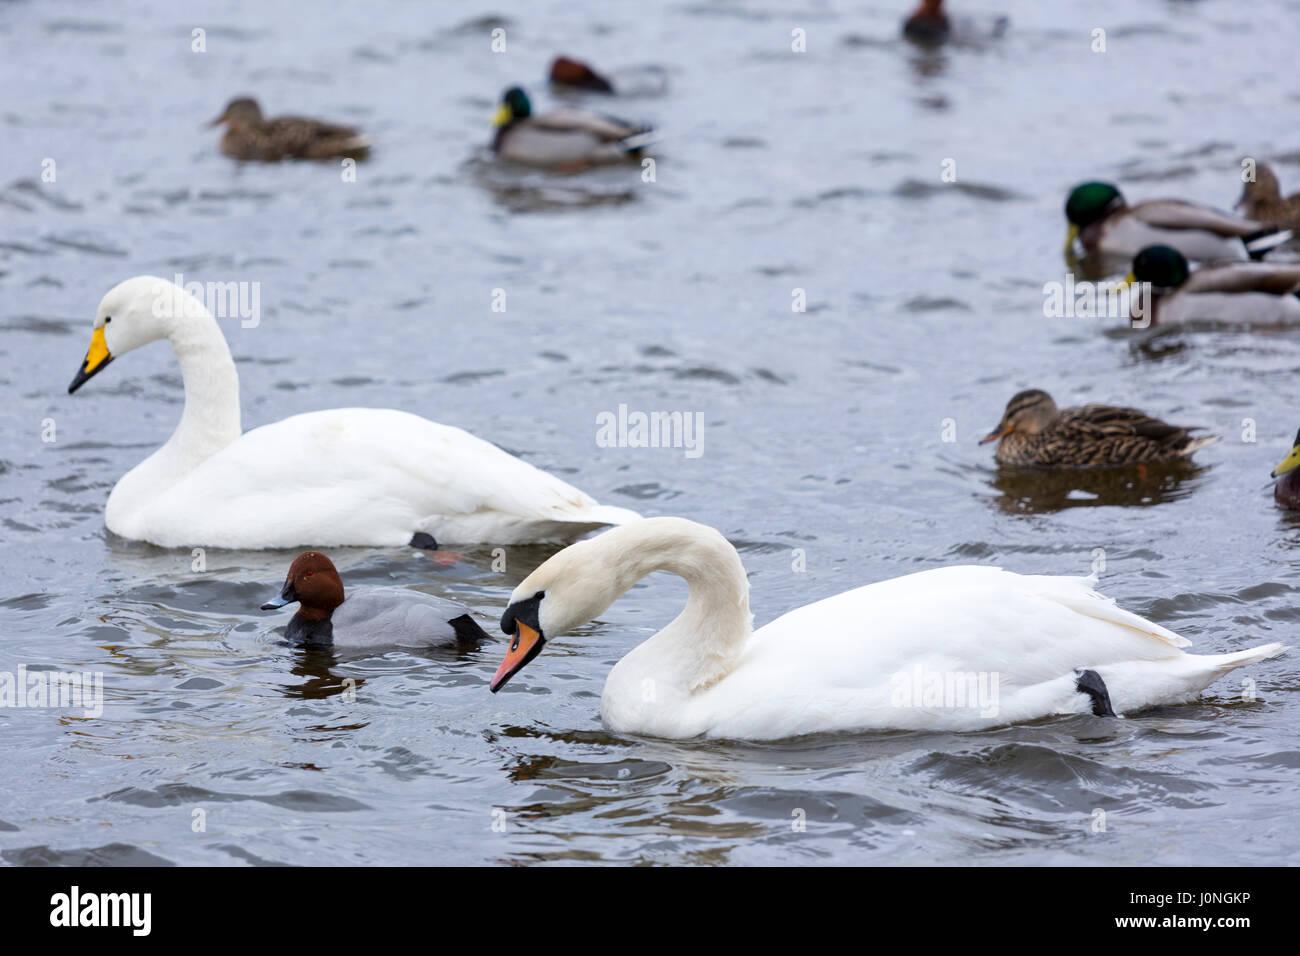 Whooper Swan, Cygnus cygnus and Mute Swan, Cygnus olor, with Pochard and Mallard ducks, at Welney Wetland Centre, - Stock Image